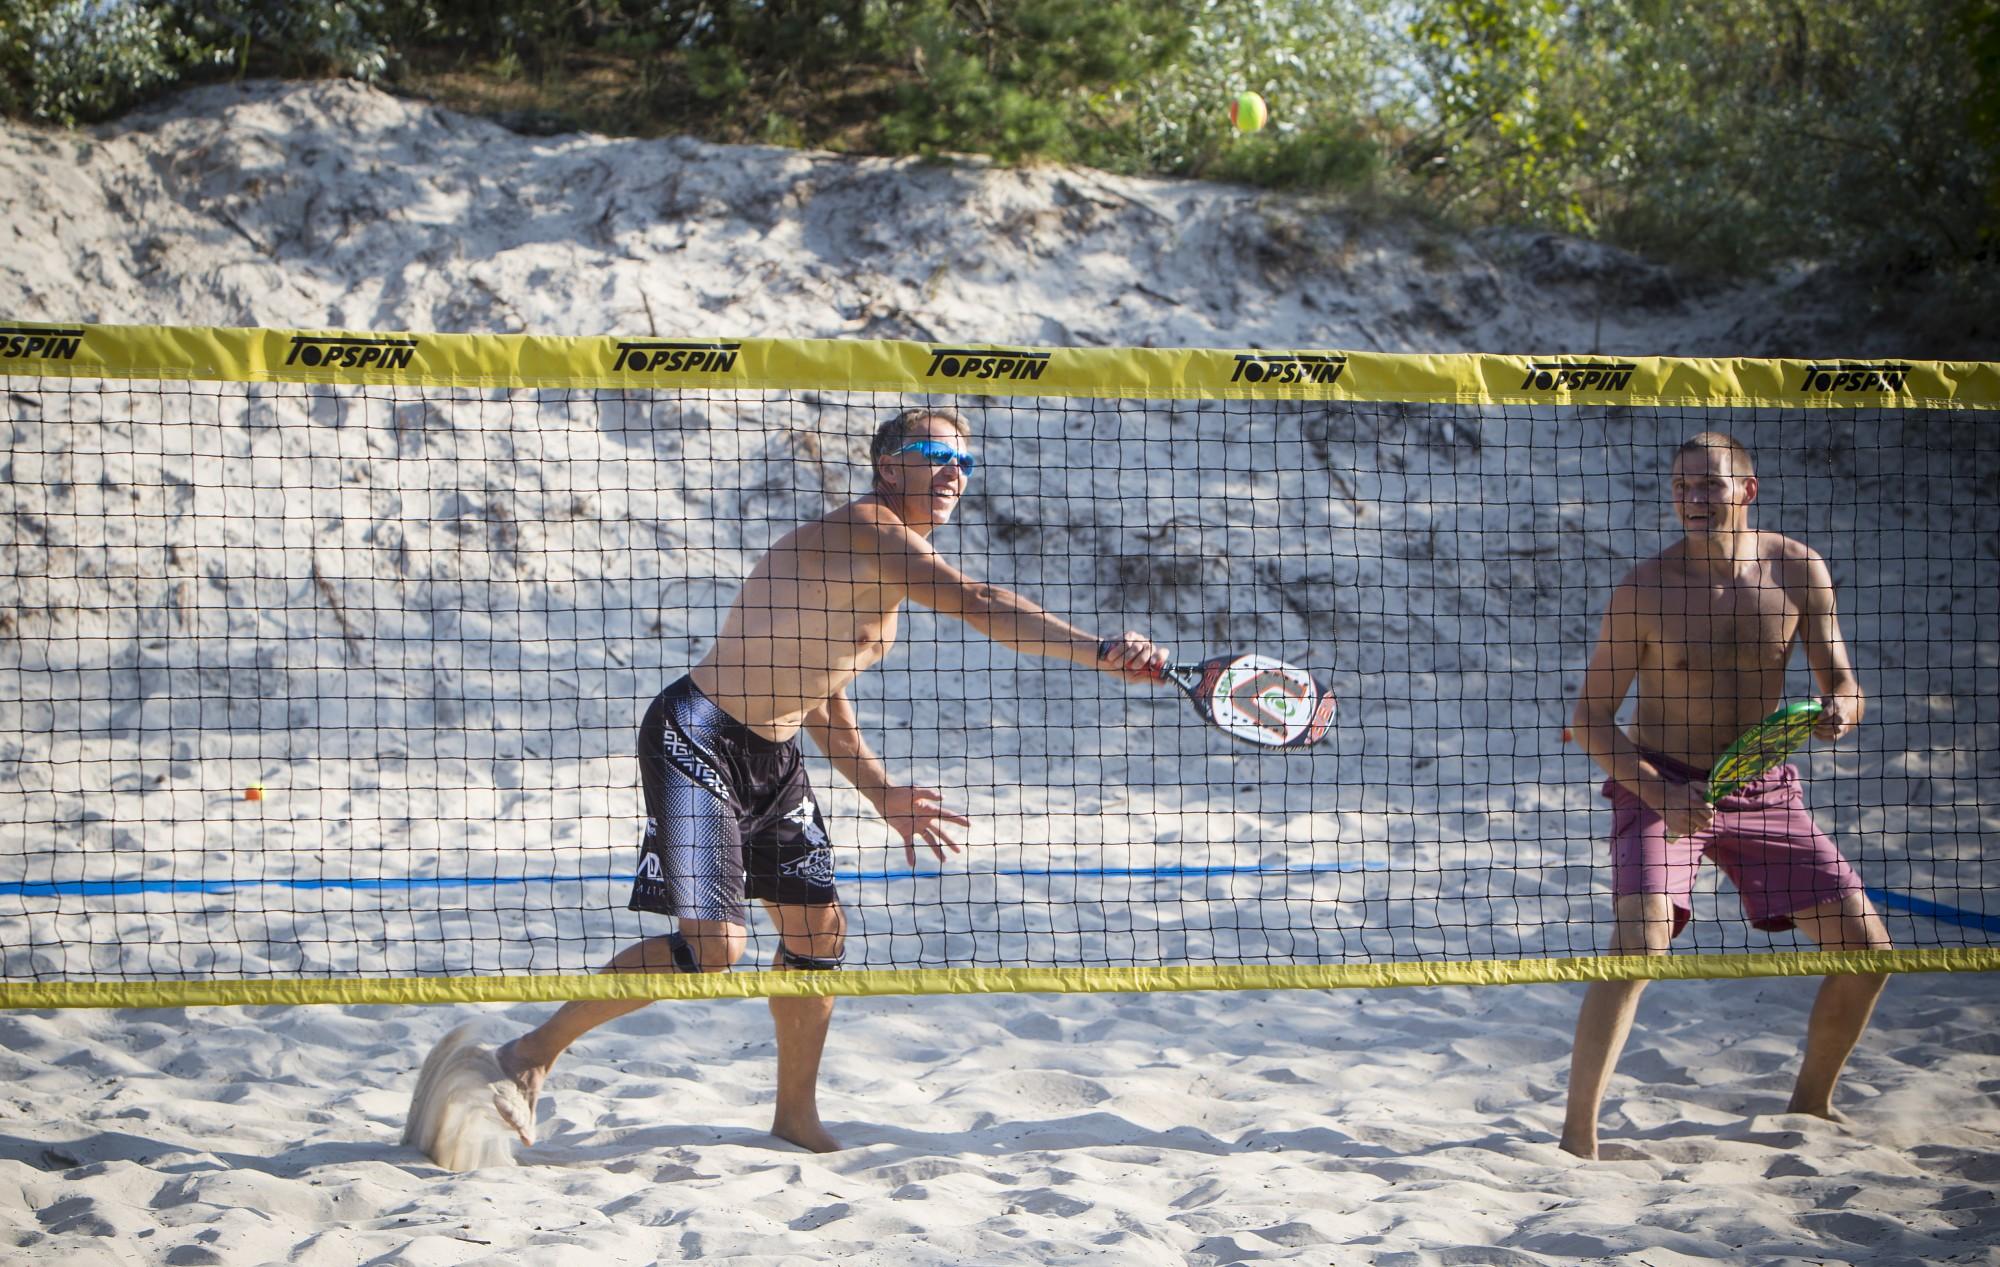 Aizvada pludmales tenisa trešo posmu